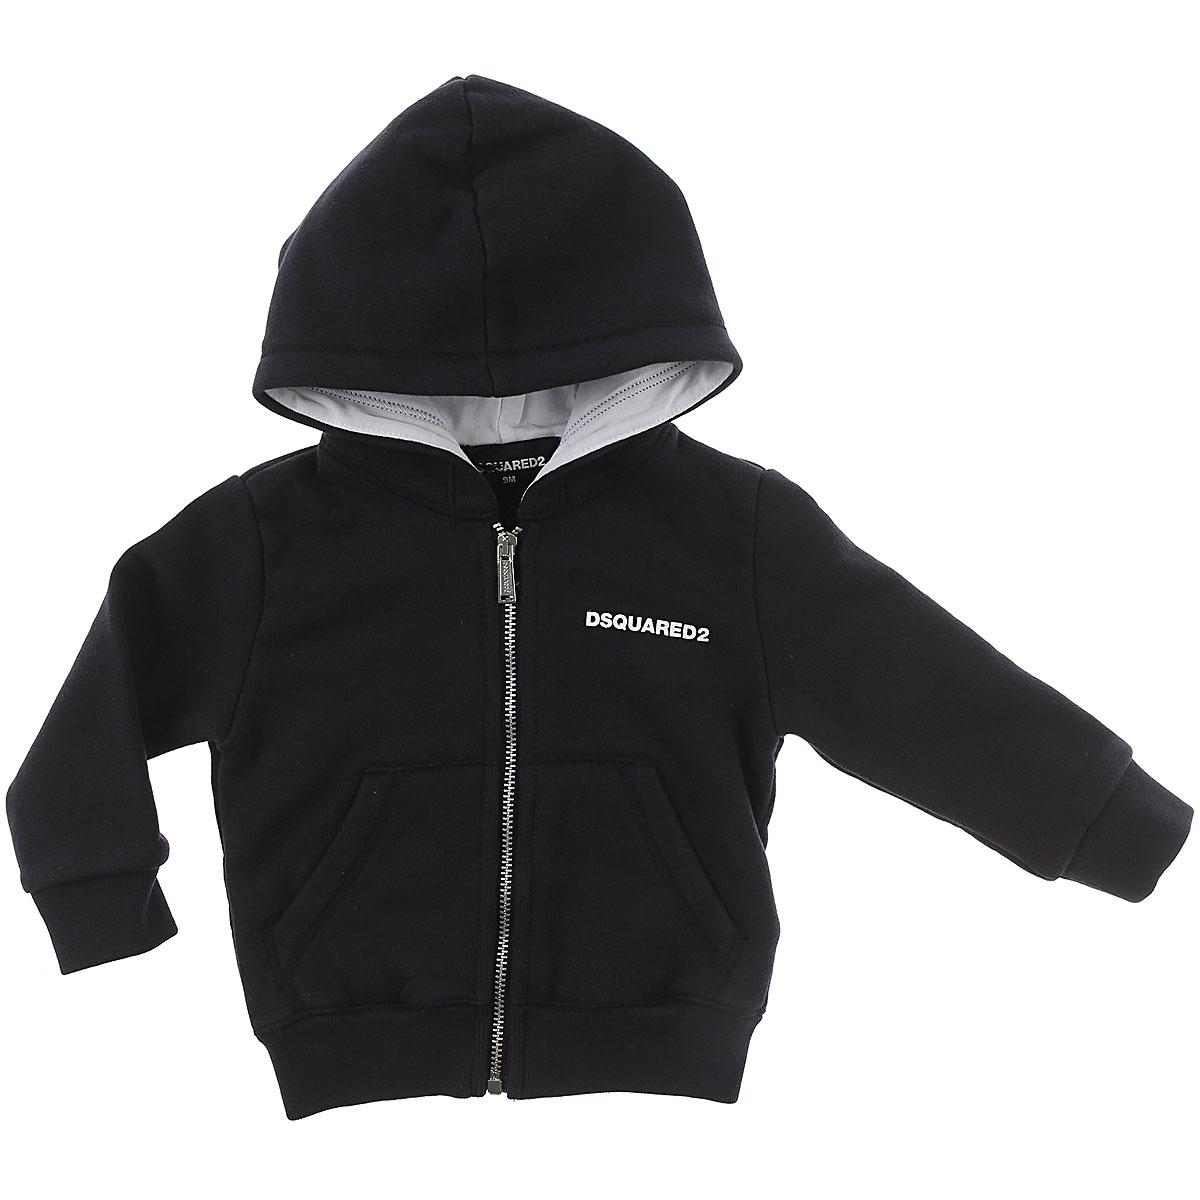 Image of Dsquared2 Baby Sweatshirts & Hoodies for Boys, Blue, Cotton, 2017, 12M 15 18M 2Y 3M 3Y 6M 9M